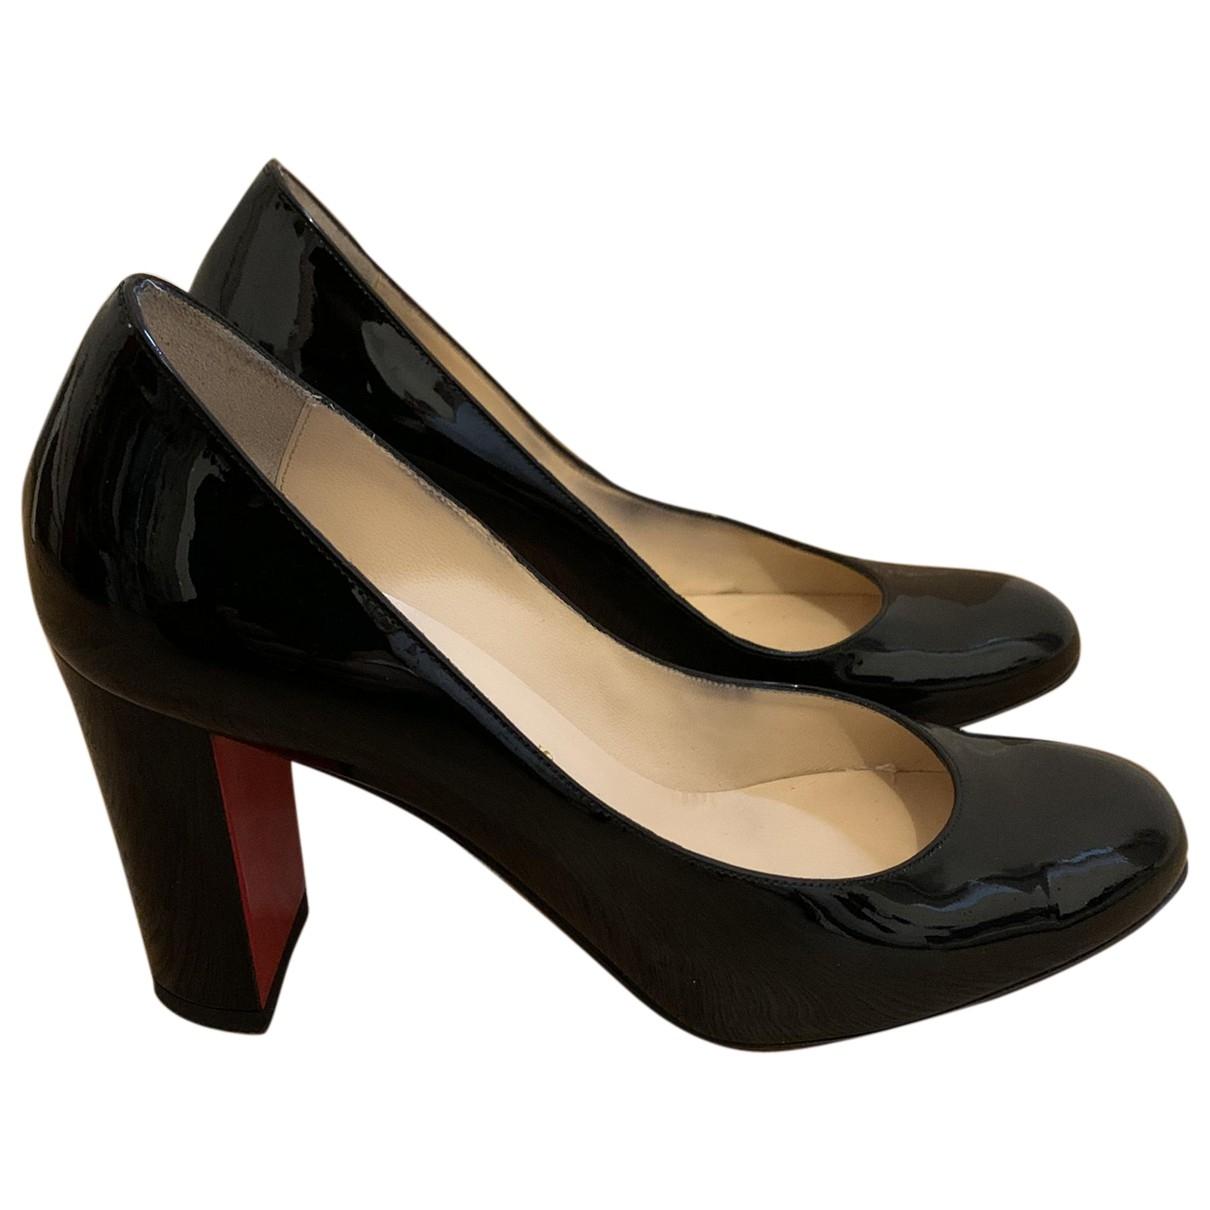 Christian Louboutin \N Black Patent leather Heels for Women 35 EU